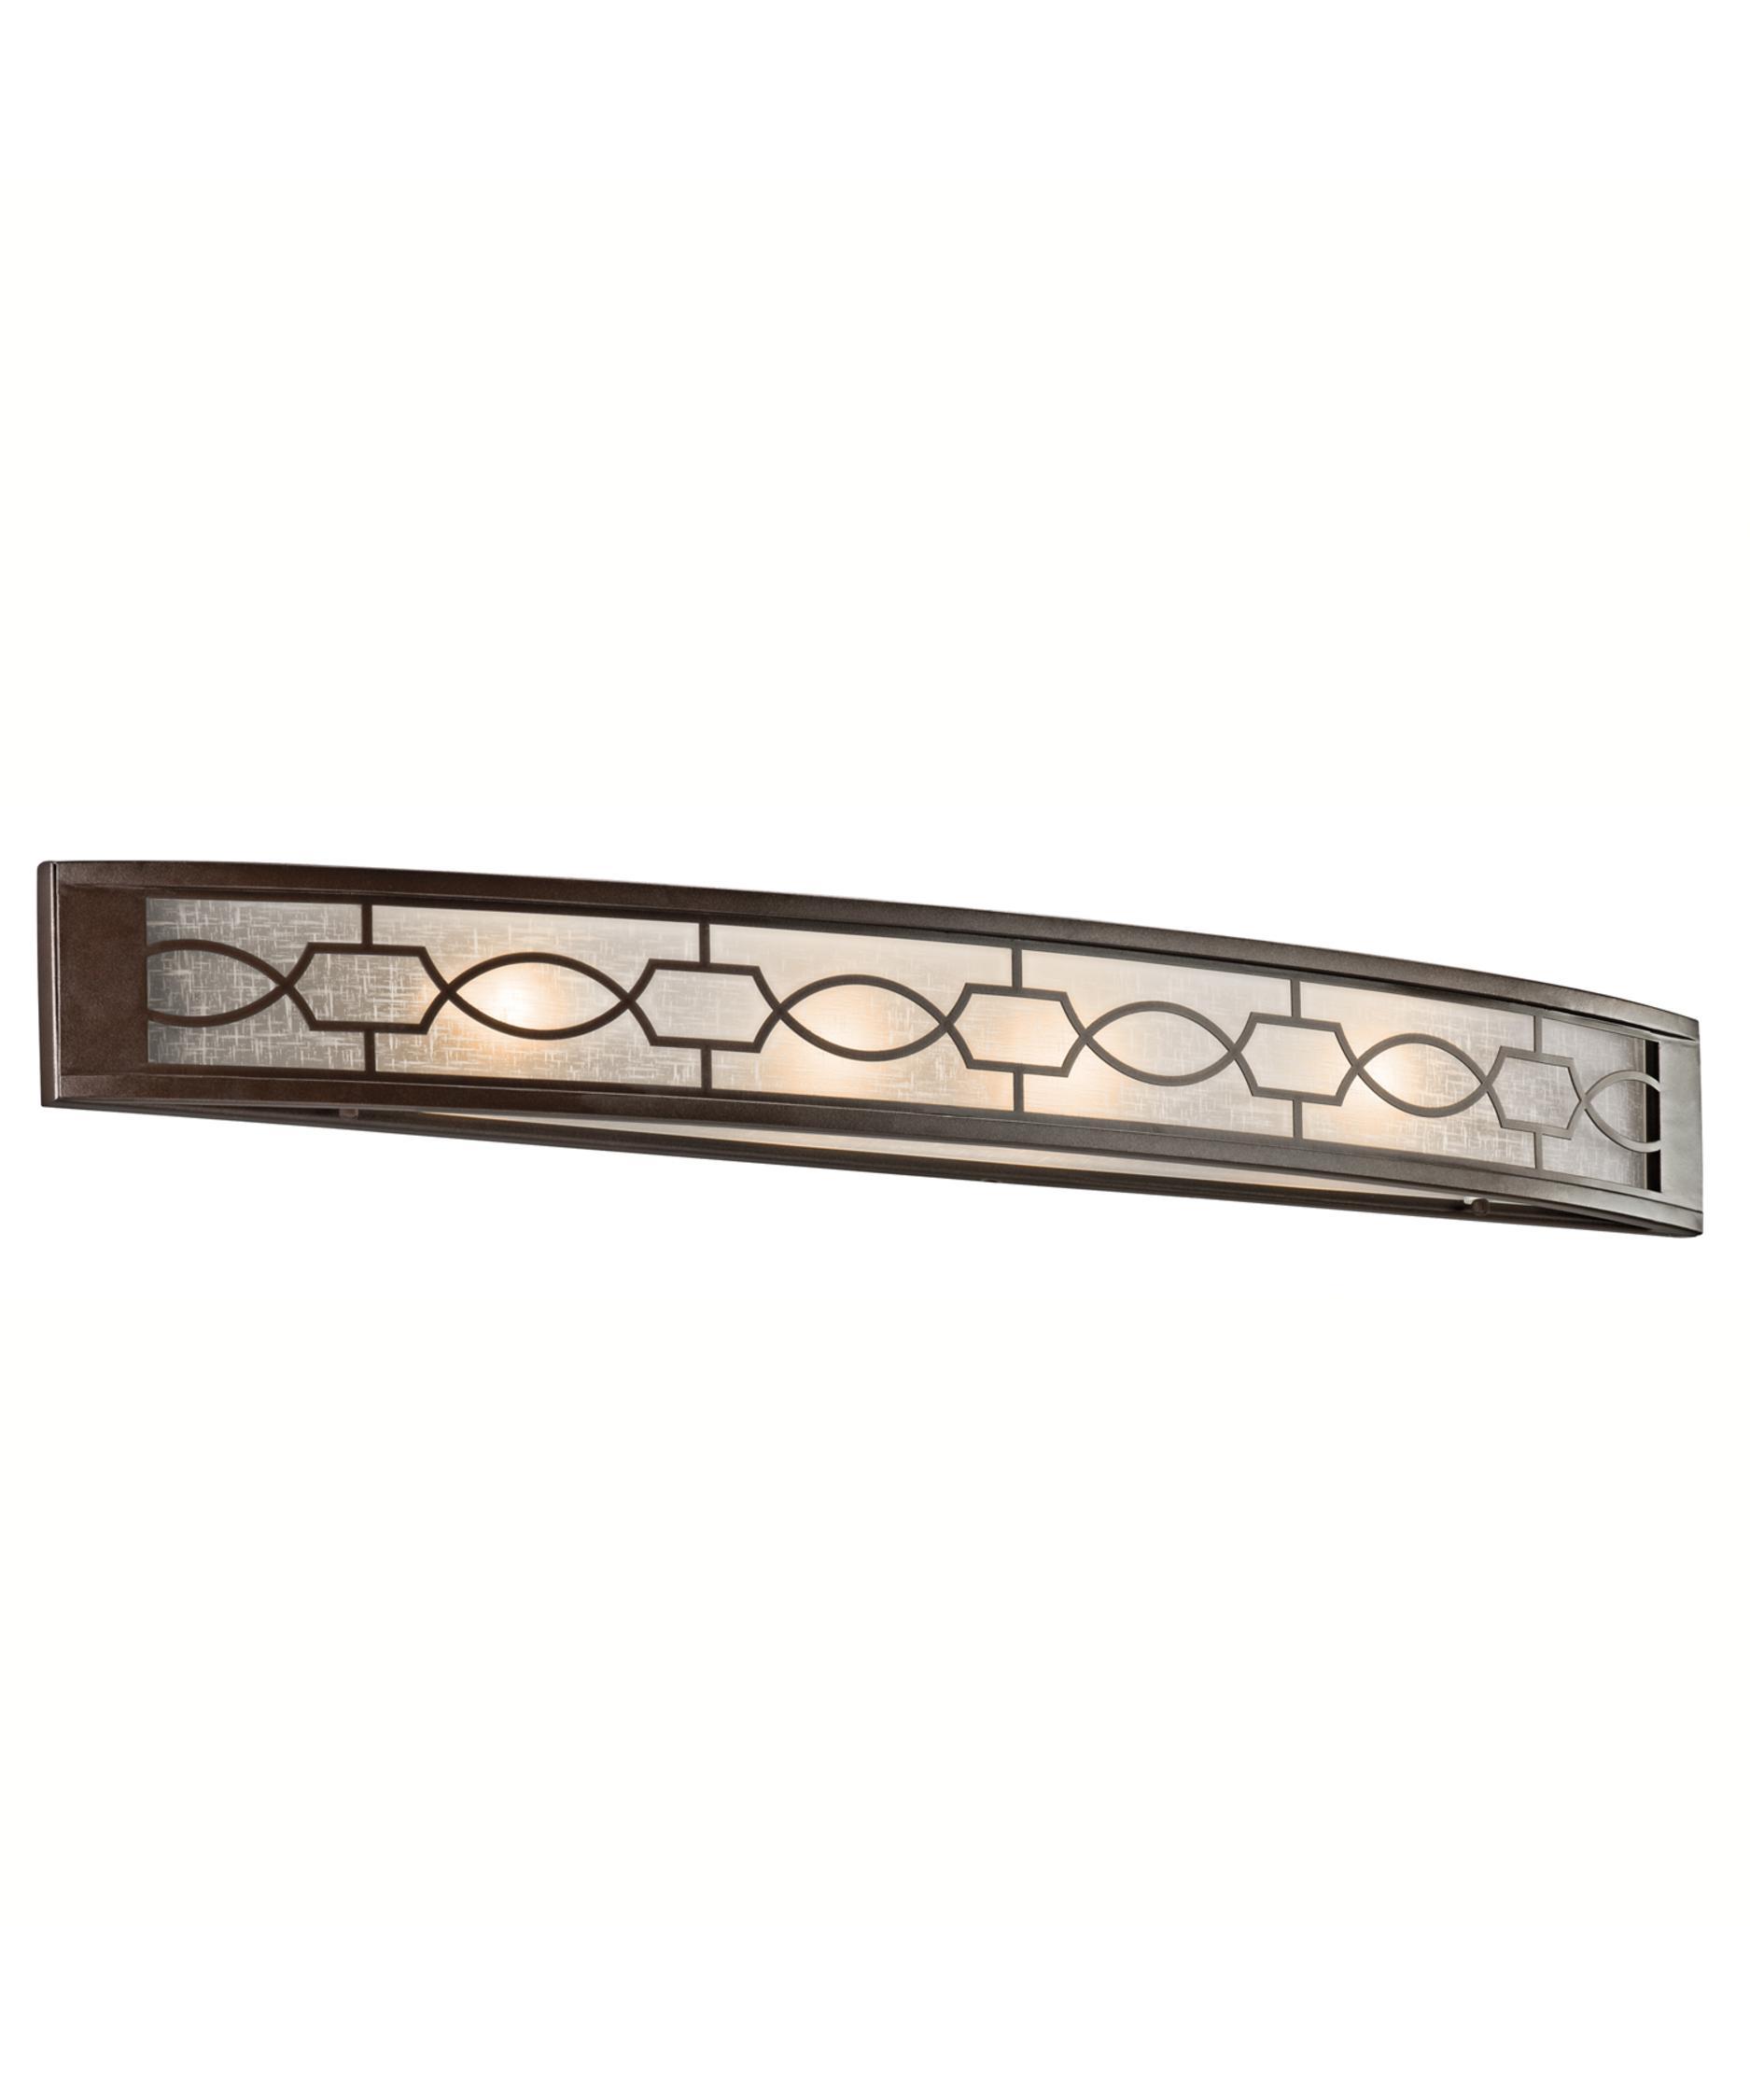 Kichler 45353 Punctuation 36 Inch Bath Vanity Light Capitol Lighting 1